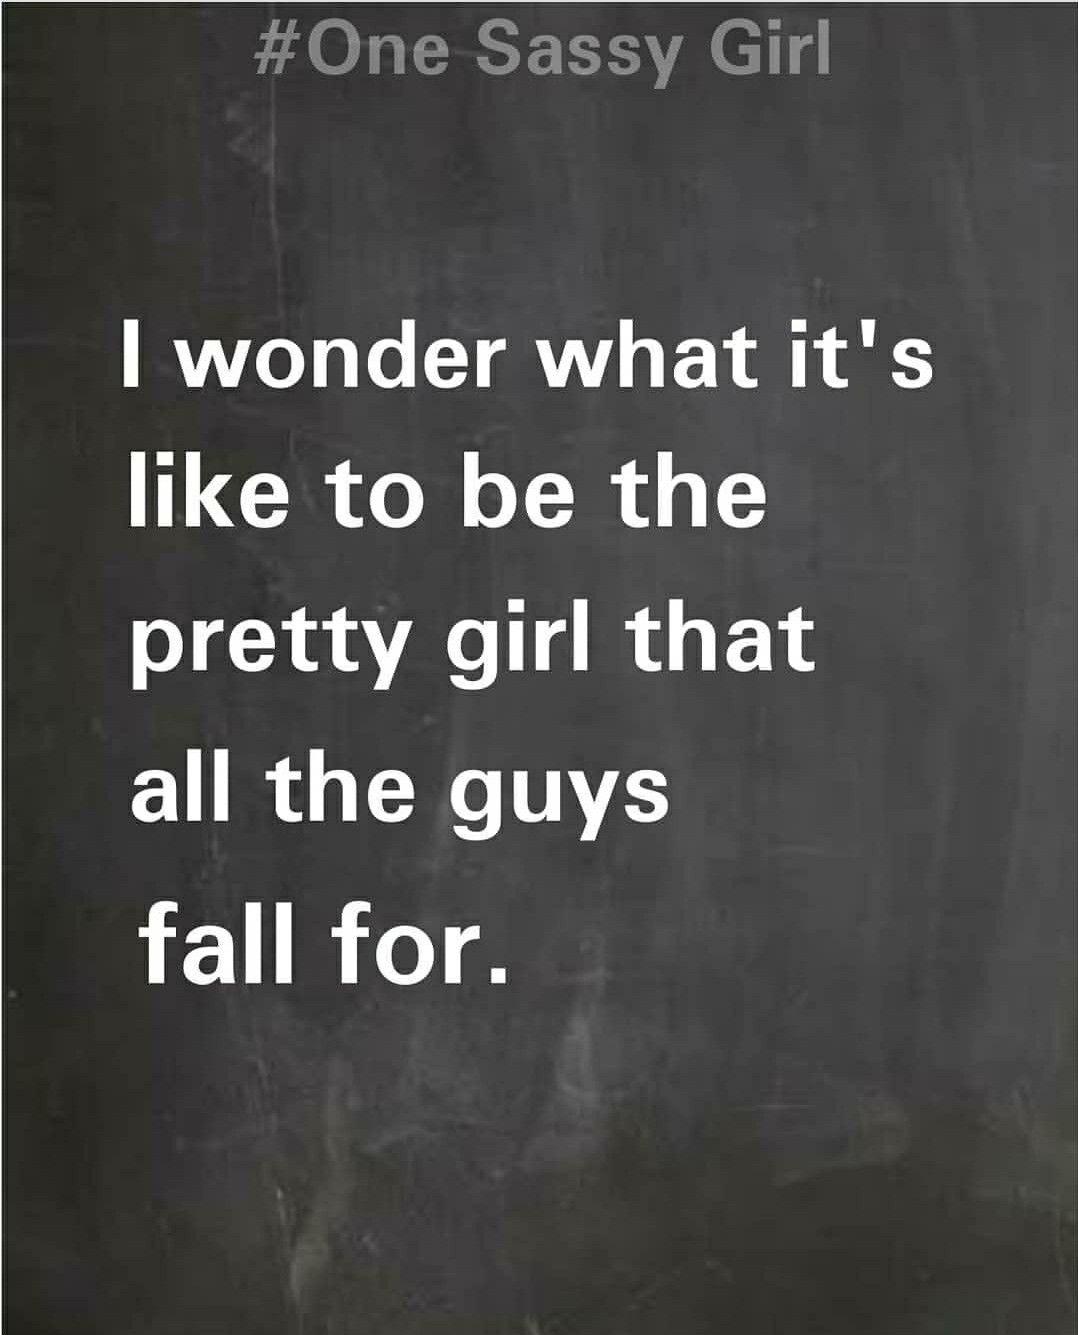 Sassy Girl Quotes Pretty girls/ ugly girls sassy quotes from one sassy girl on  Sassy Girl Quotes